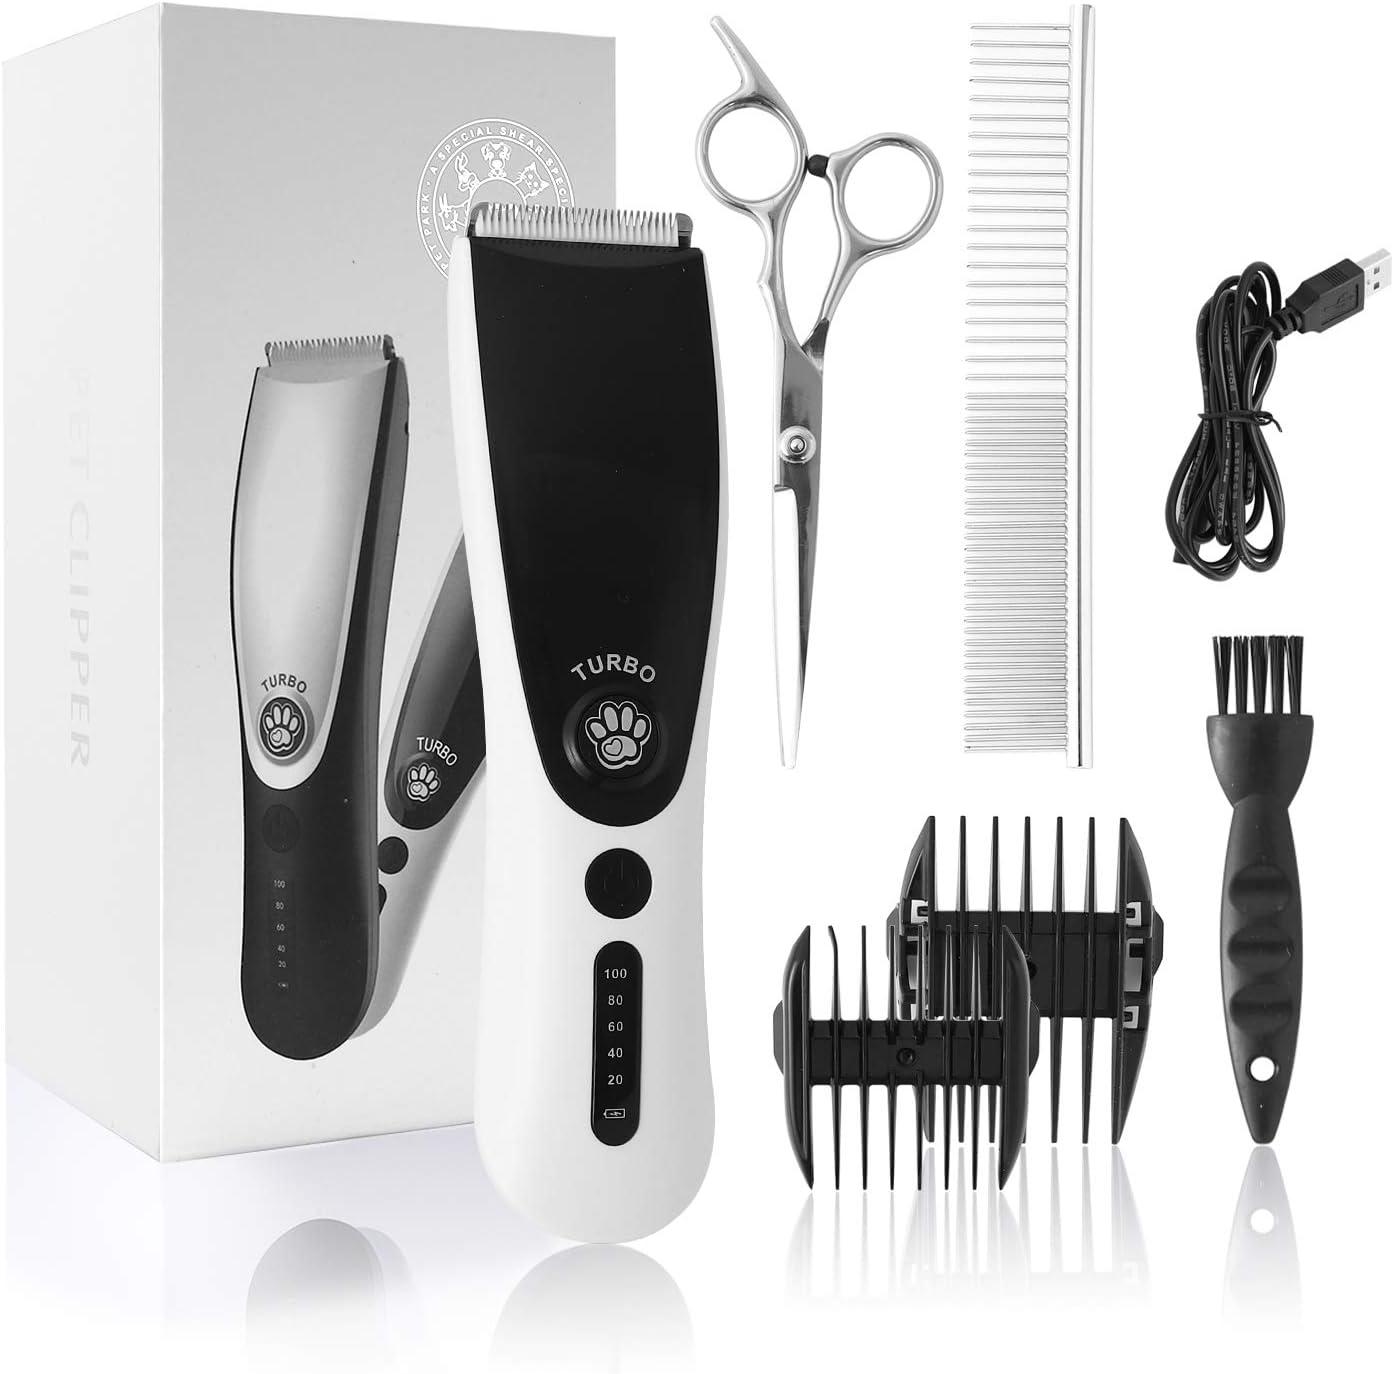 ZENIJUST Recargable eléctrico Pet Clipper Kit inalámbrico de Pelo para Mascotas Trimmer Kit de bajo Ruido Cat Hair Shaver cortapelos para Mascotas